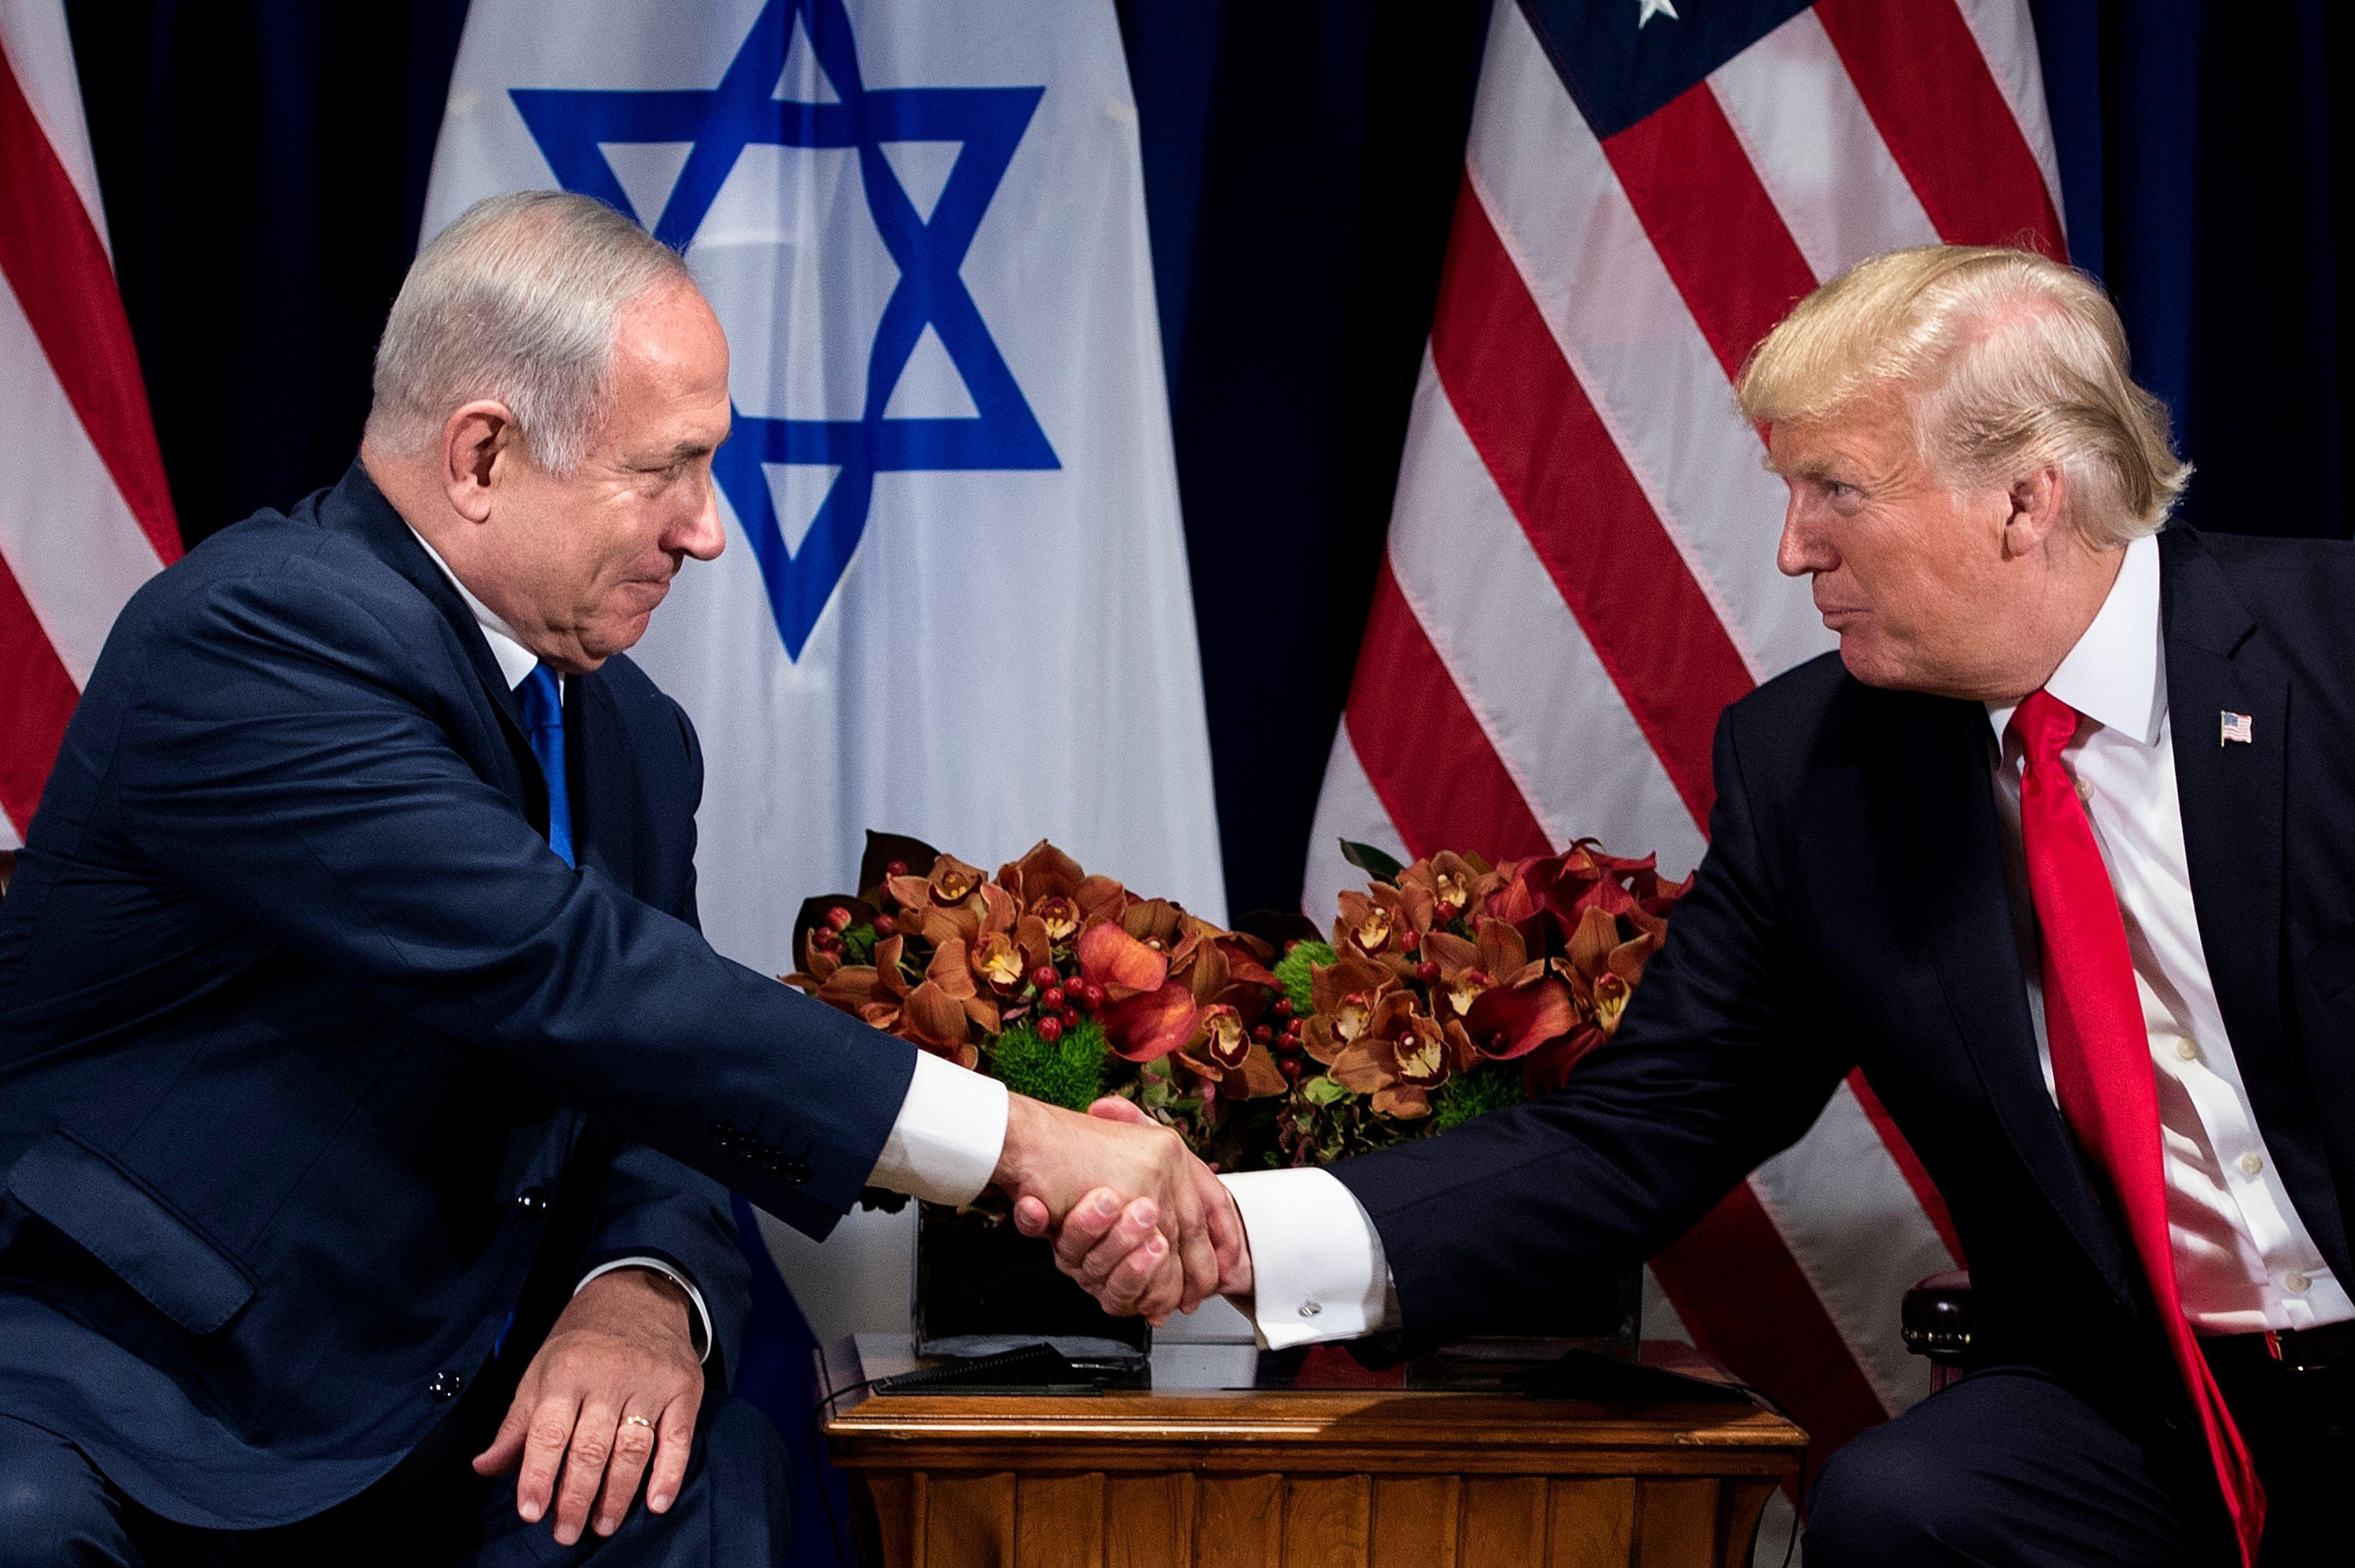 cbsnews.com - Trump meets with Netanyahu as Israeli military strikes Hamas targets - live updates